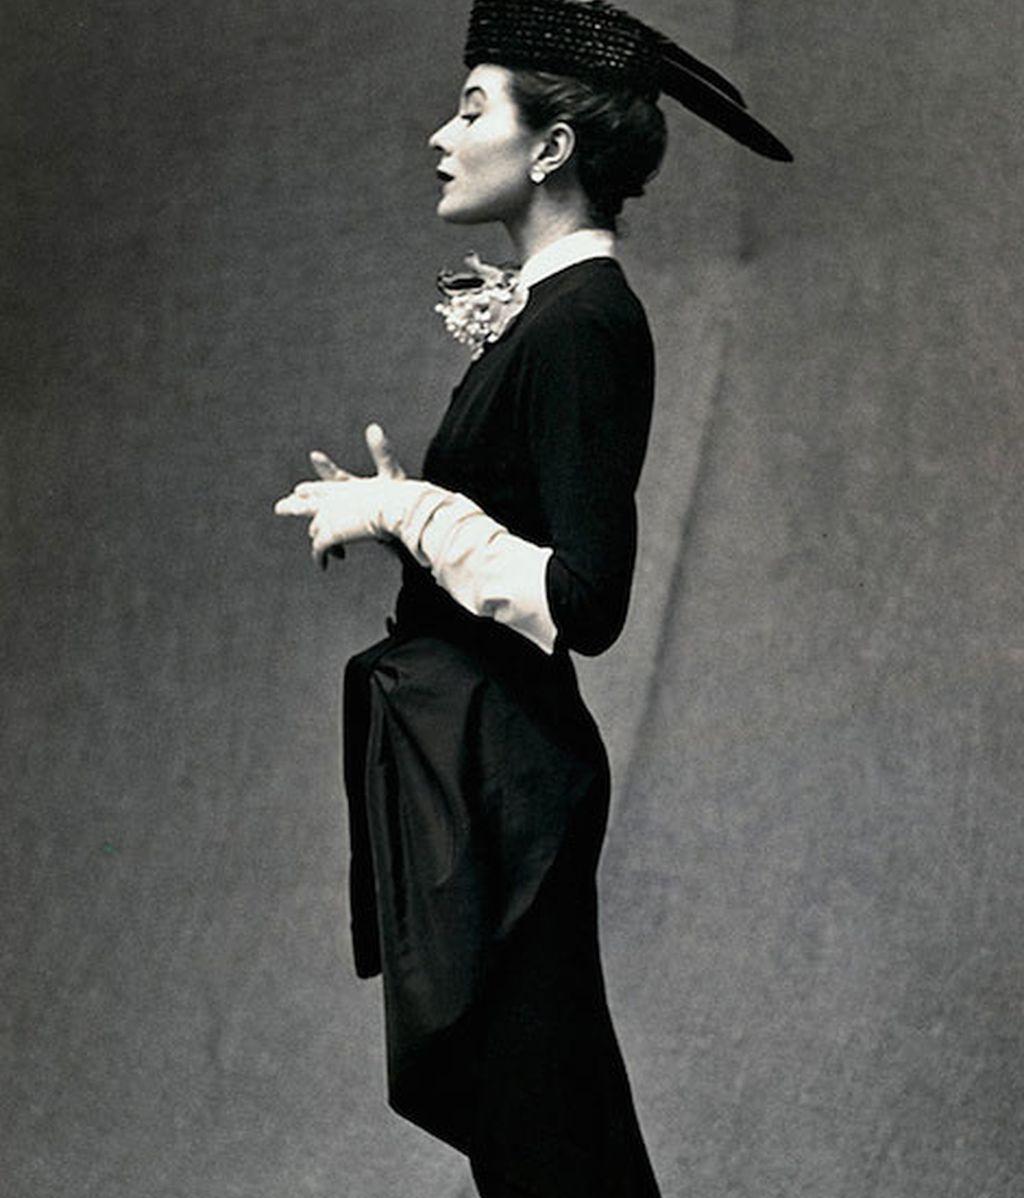 Fallece la modelo Bettina Graziani